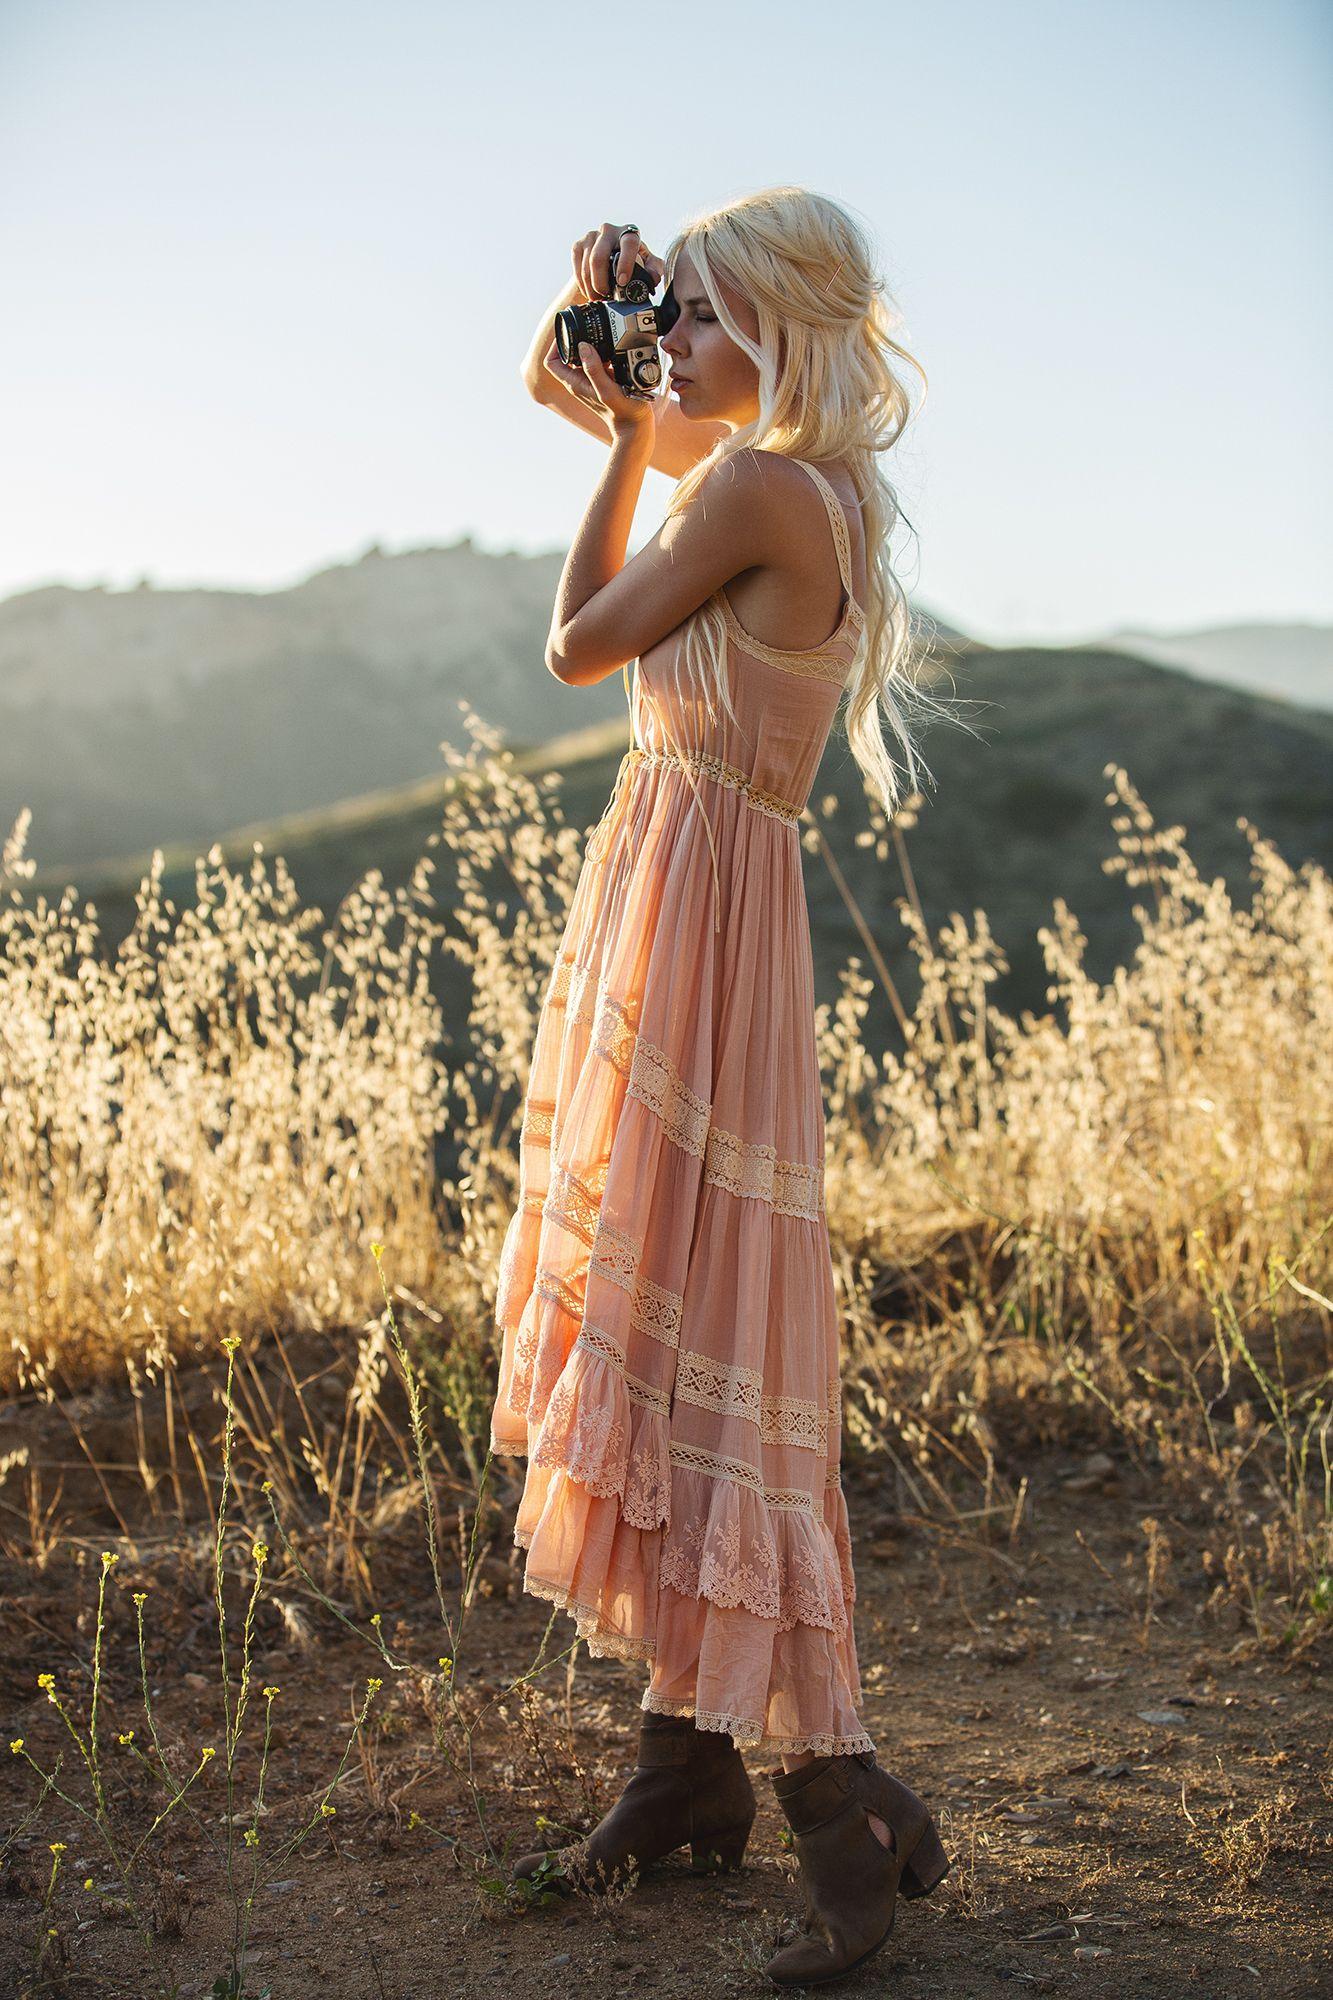 Best 25 Bohemian Decor Ideas On Pinterest: Best 25+ Boho Beautiful Ideas On Pinterest